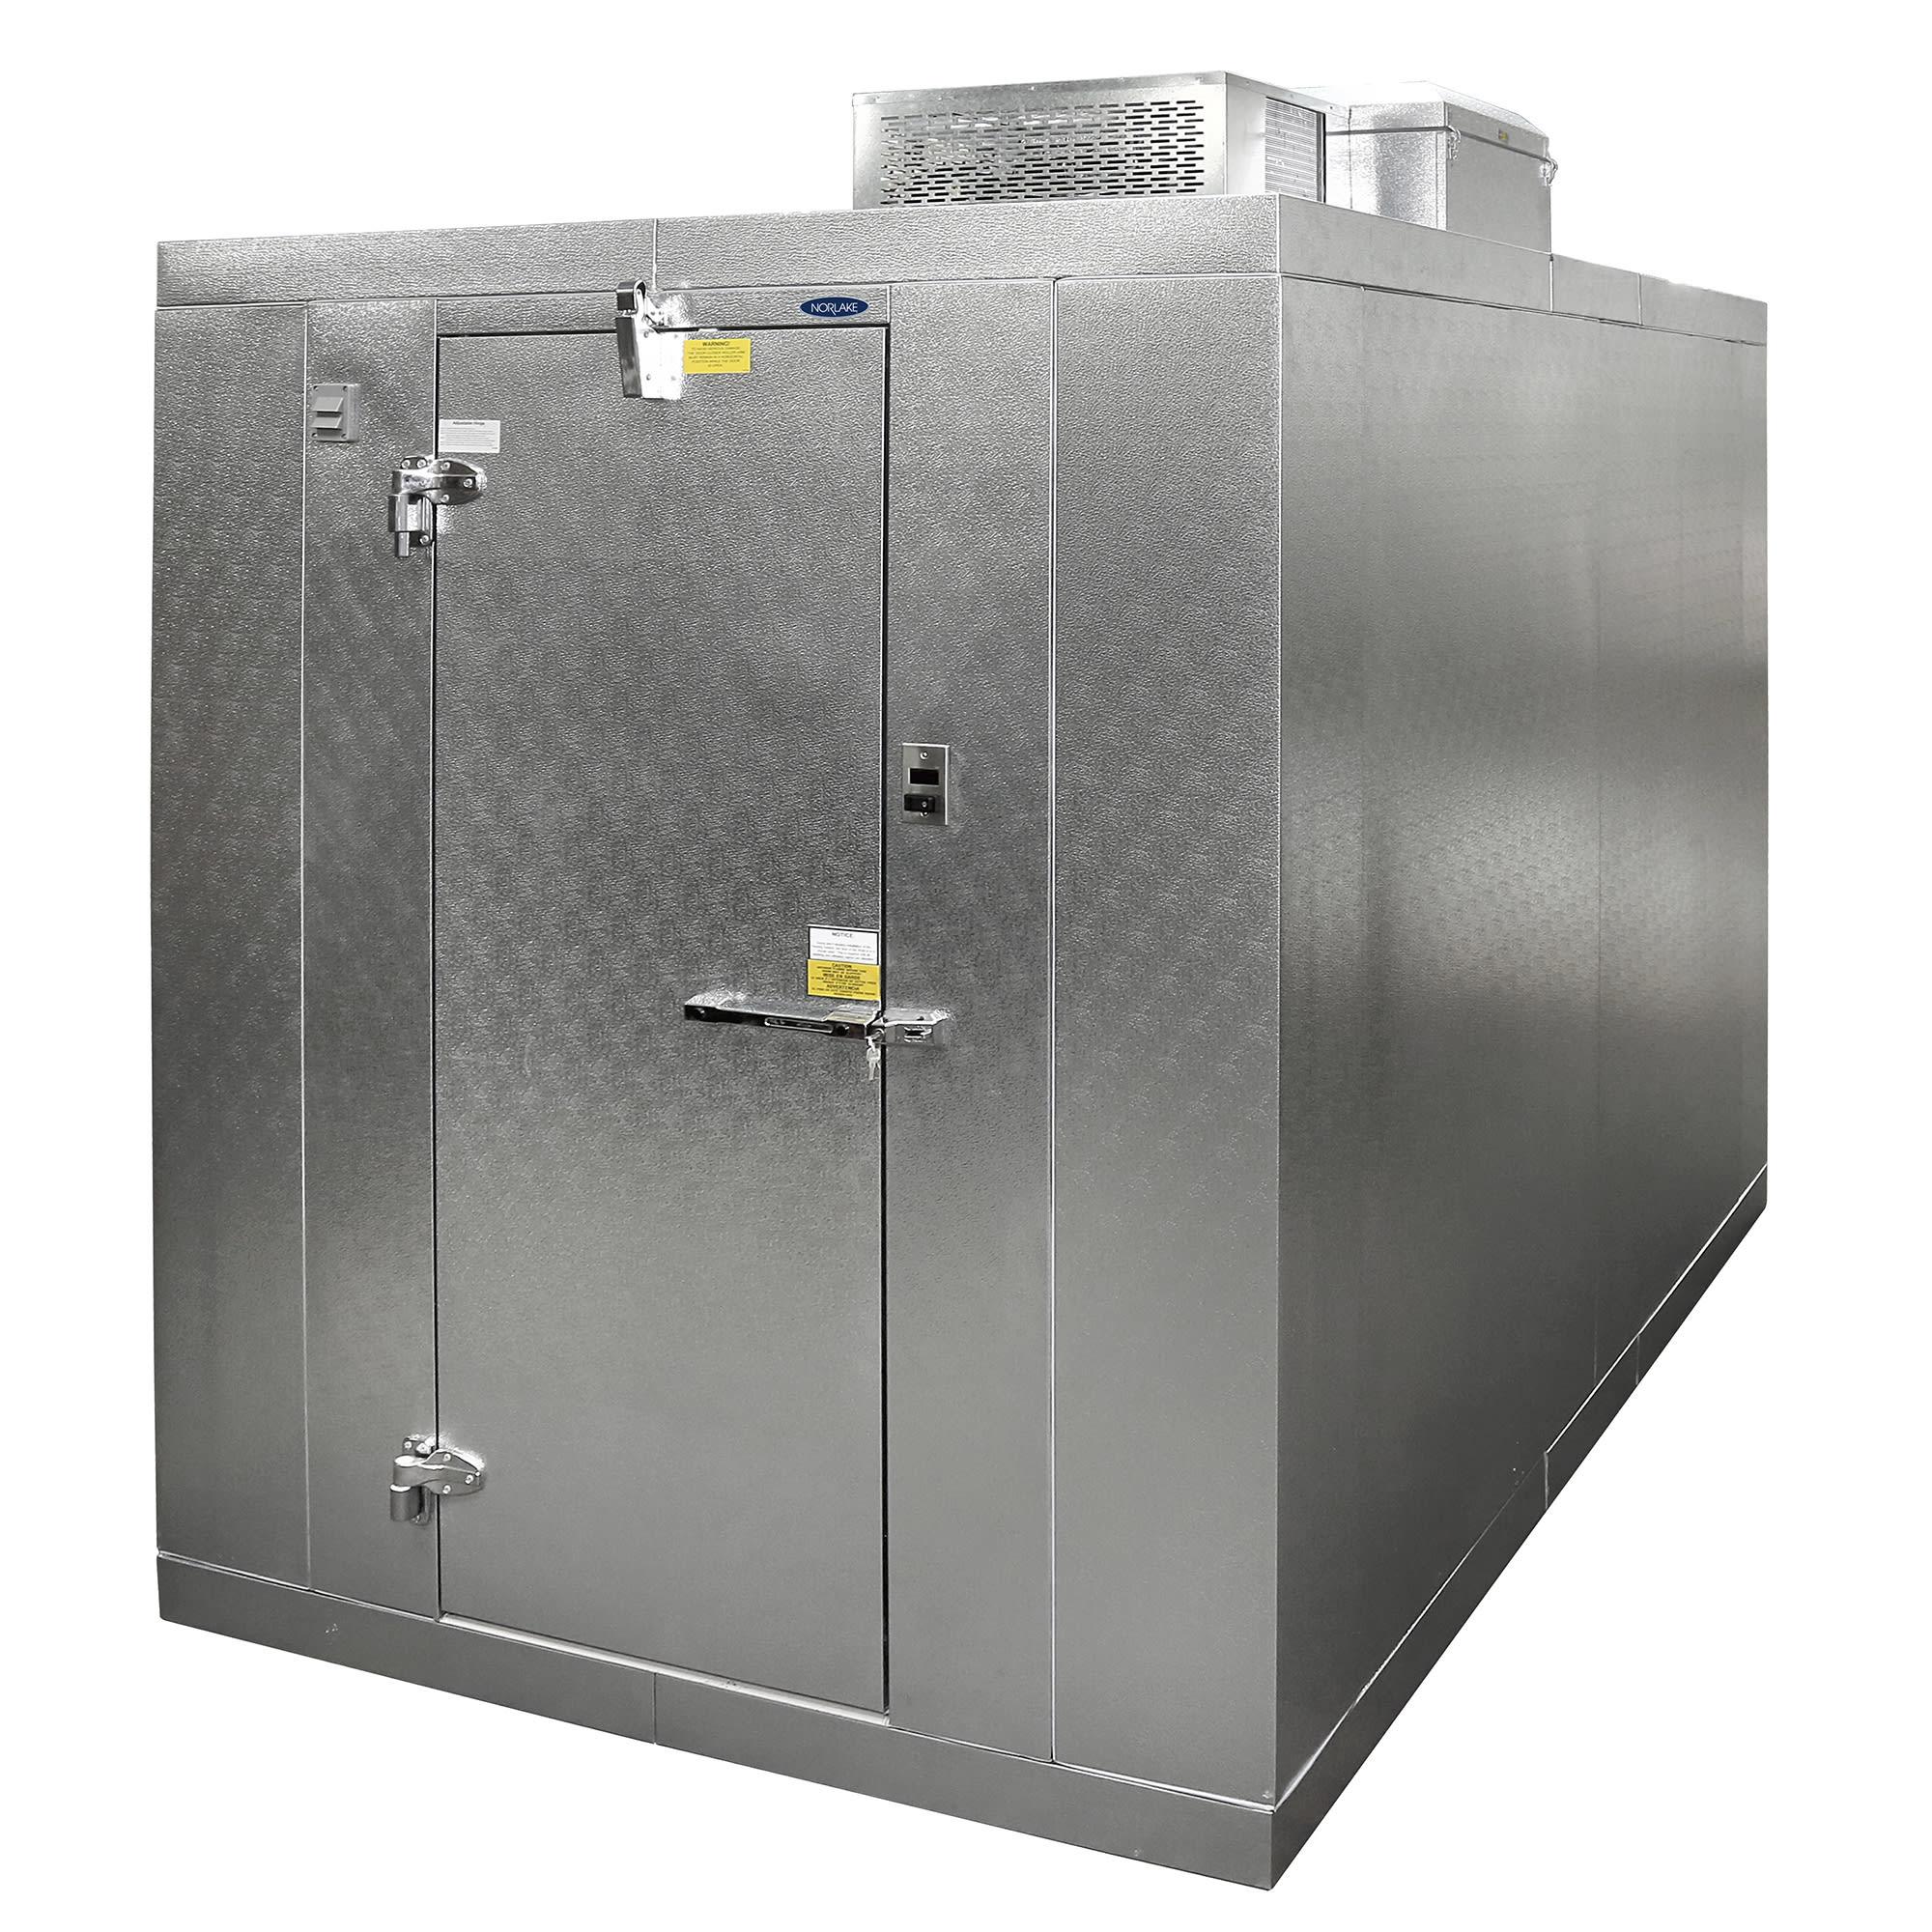 Nor-Lake KLB7488-C R Indoor Walk-In Refrigerator w/ Top M...